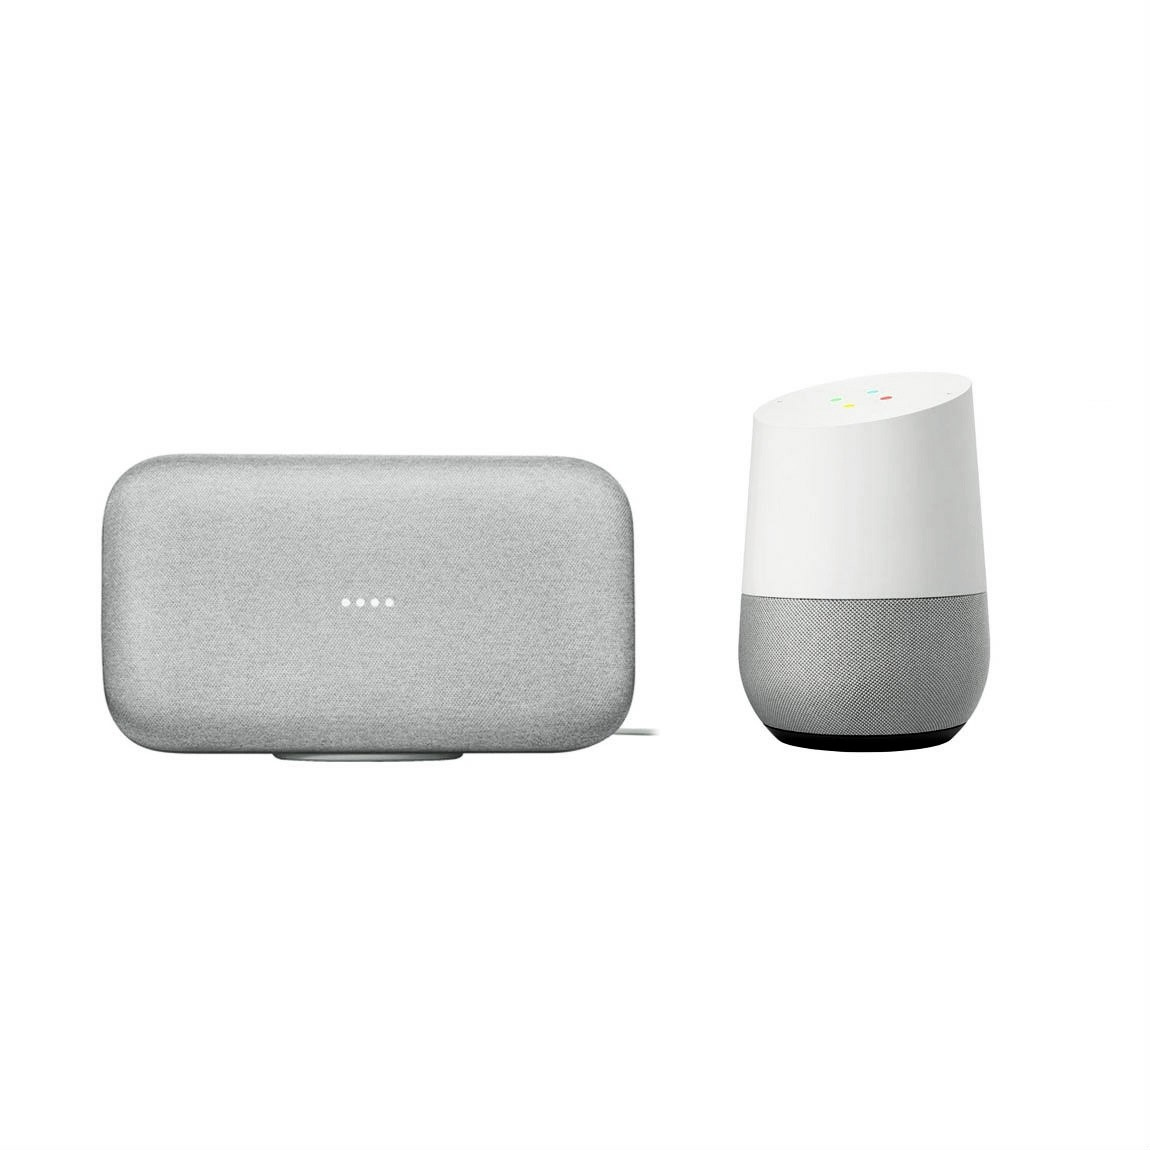 Google Nest Google Home Max + Google Home